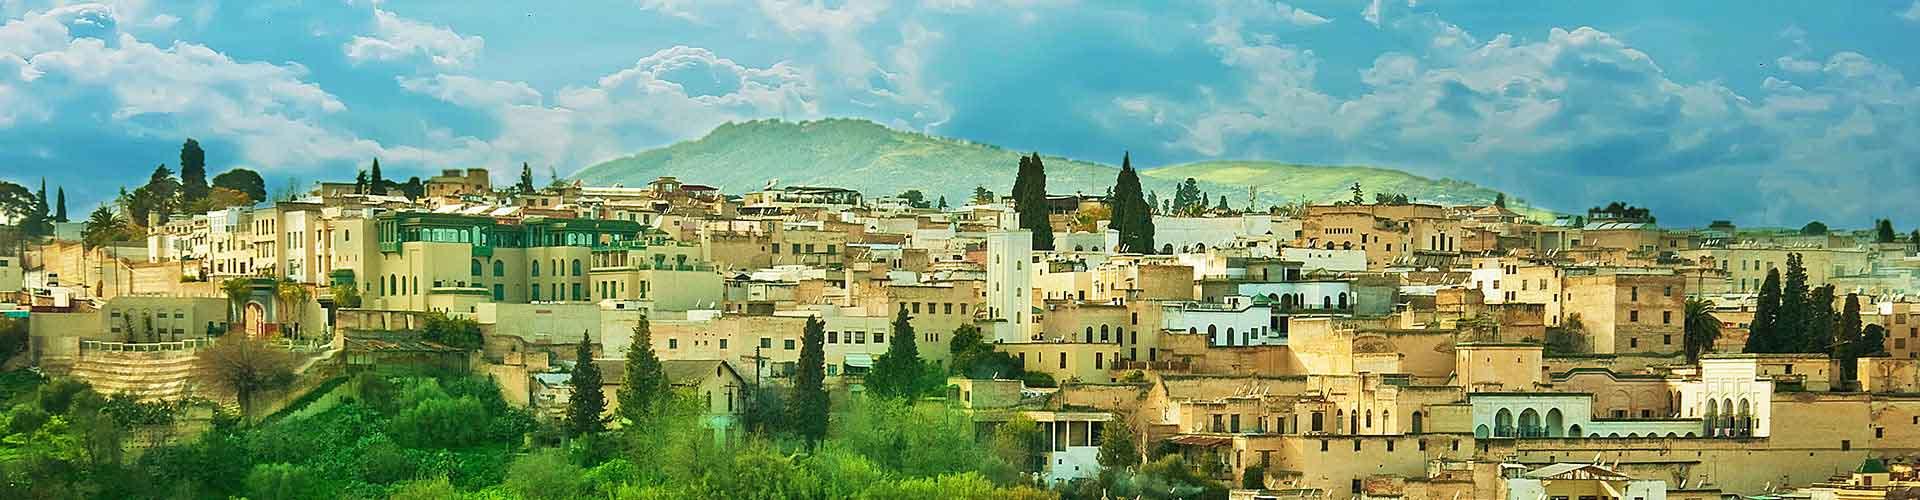 Fez - Apartamentos en Fez. Mapas de Fez, Fotos y comentarios de cada Apartamento en Fez.